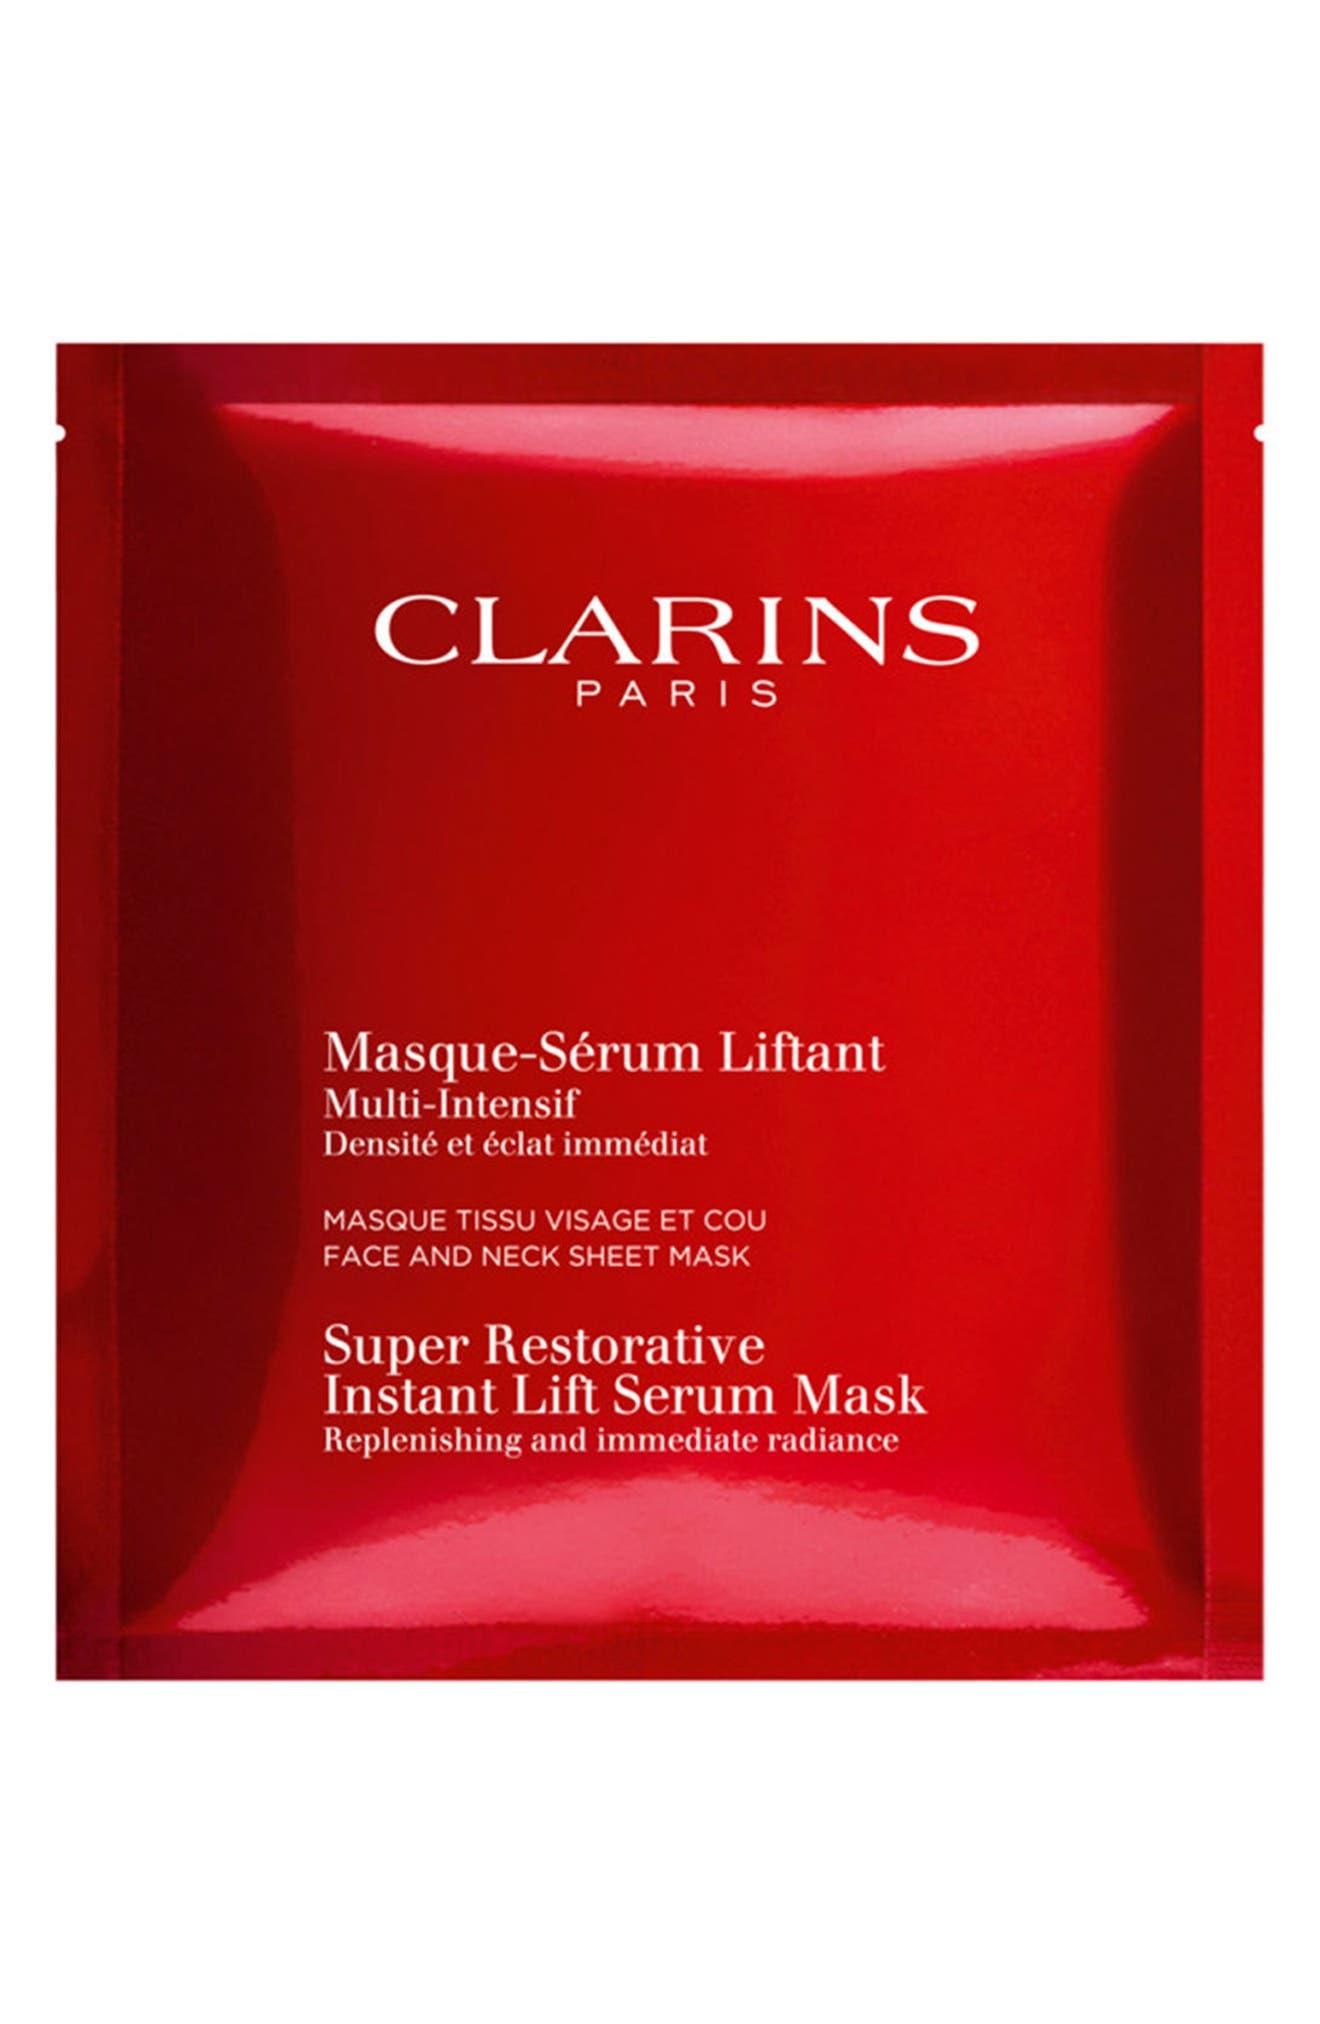 5-Pack Super Restorative Instant Lift Serum Mask,                         Main,                         color, No Color